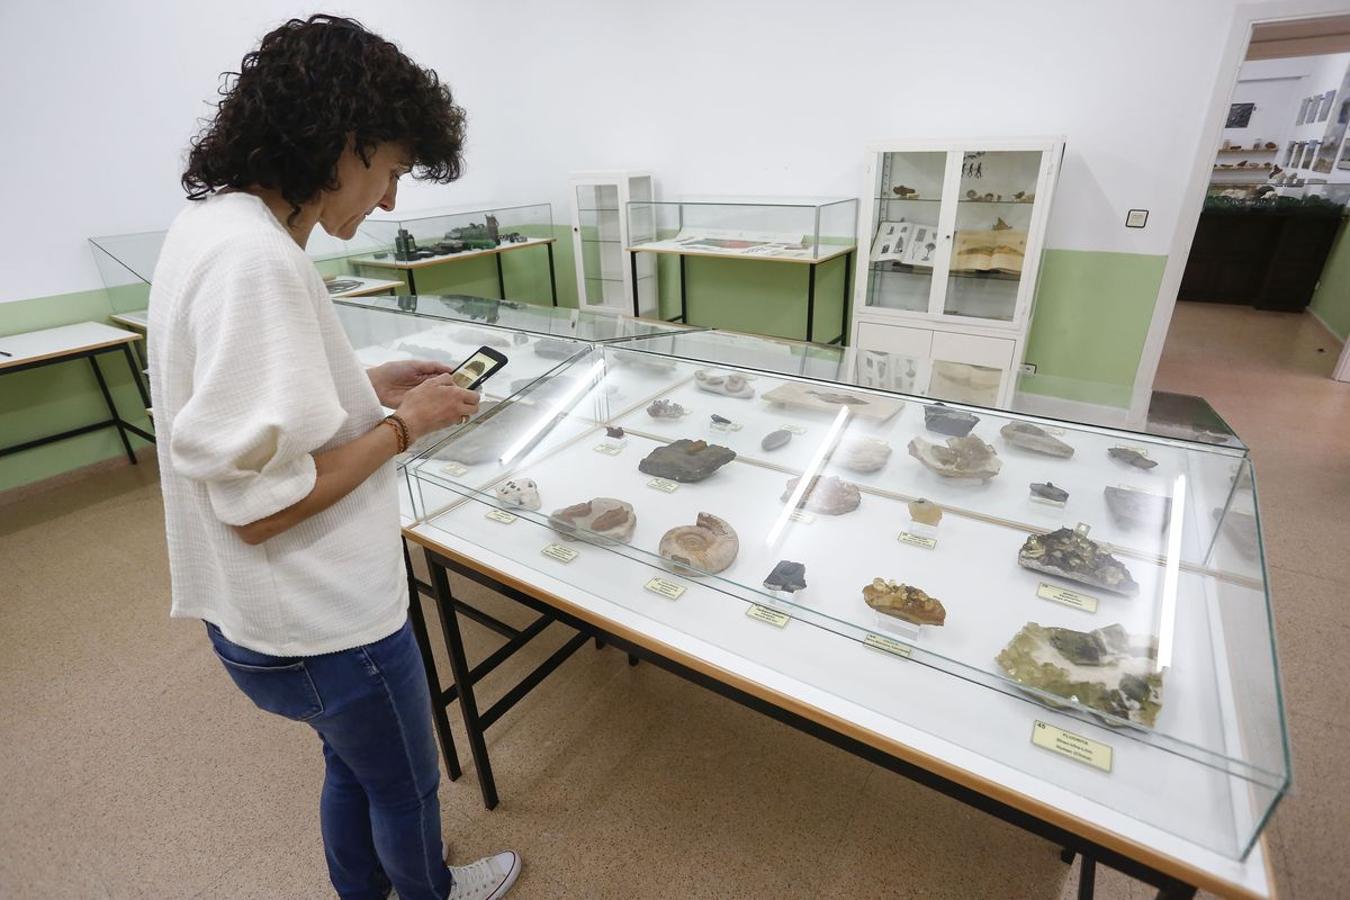 Aula Geológica de Robles de Laciana